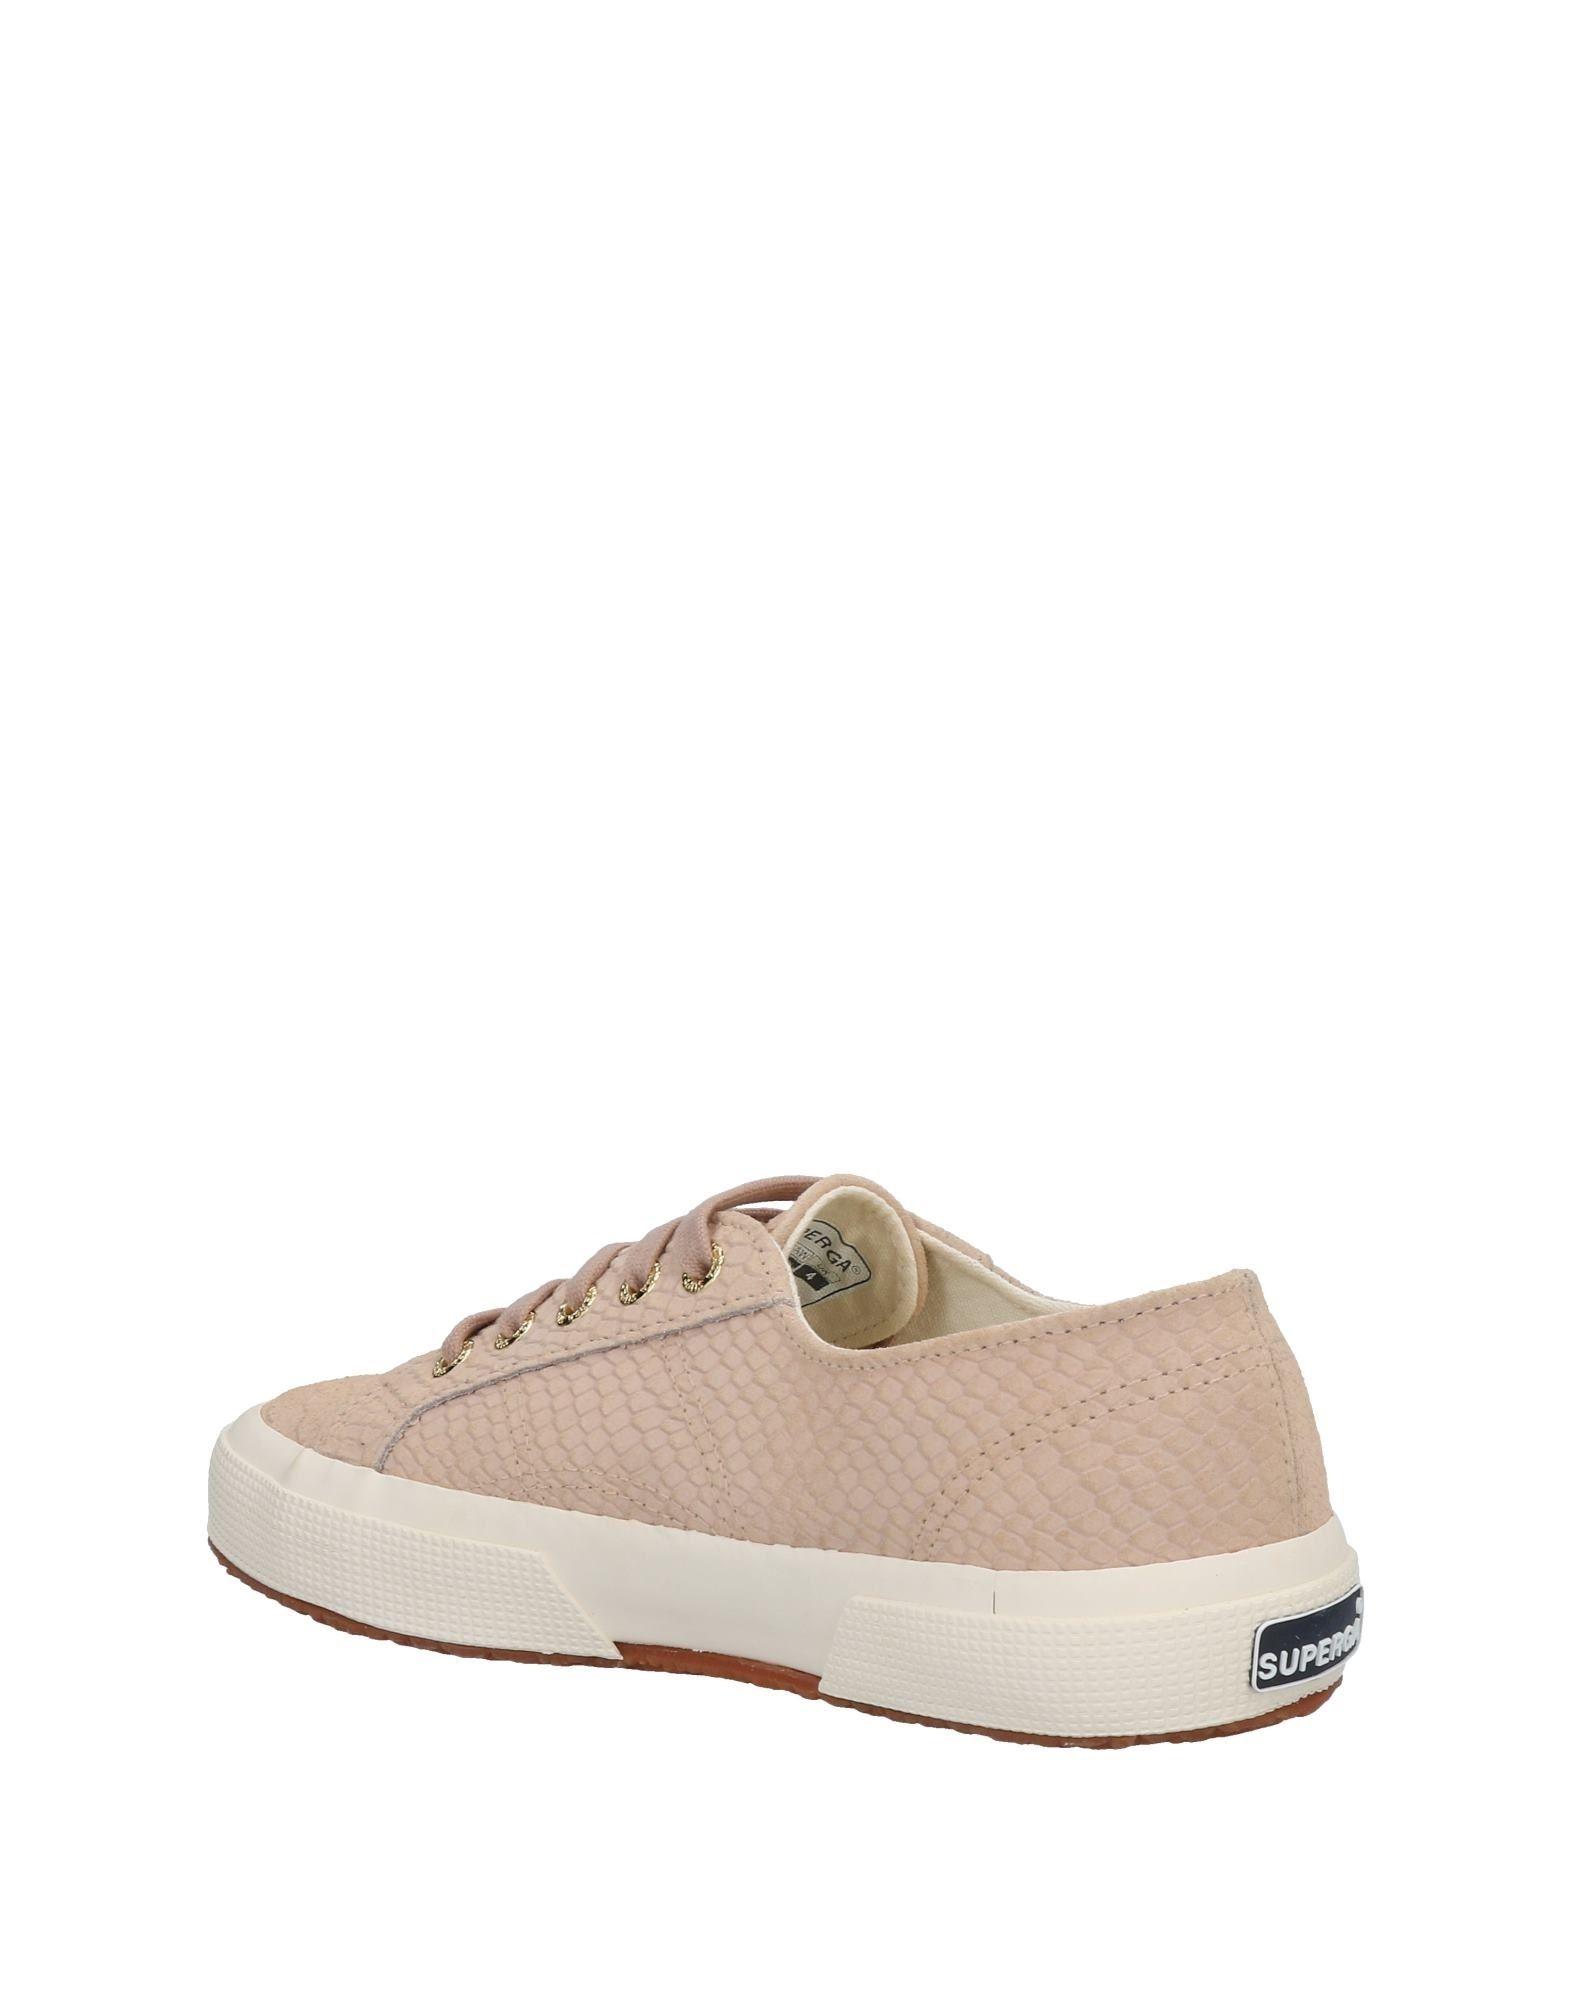 Superga® 11486489UK Sneakers Damen  11486489UK Superga® Gute Qualität beliebte Schuhe 8143ea